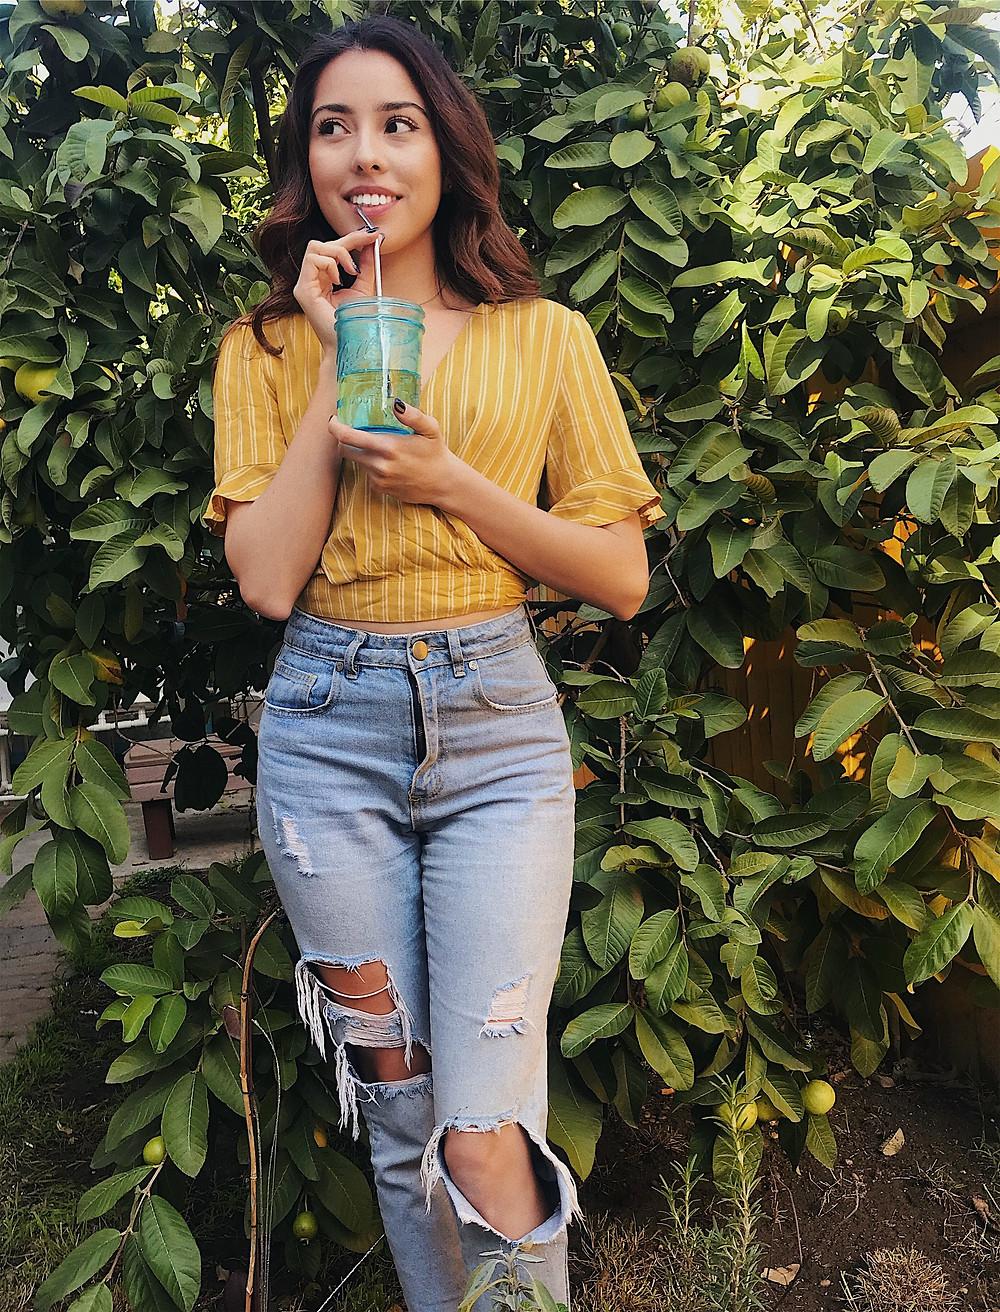 Girl Smiling holding resusable mason jar with metal straw eco friendly living sustainable zero waste lifestyle blog post 90's fashion